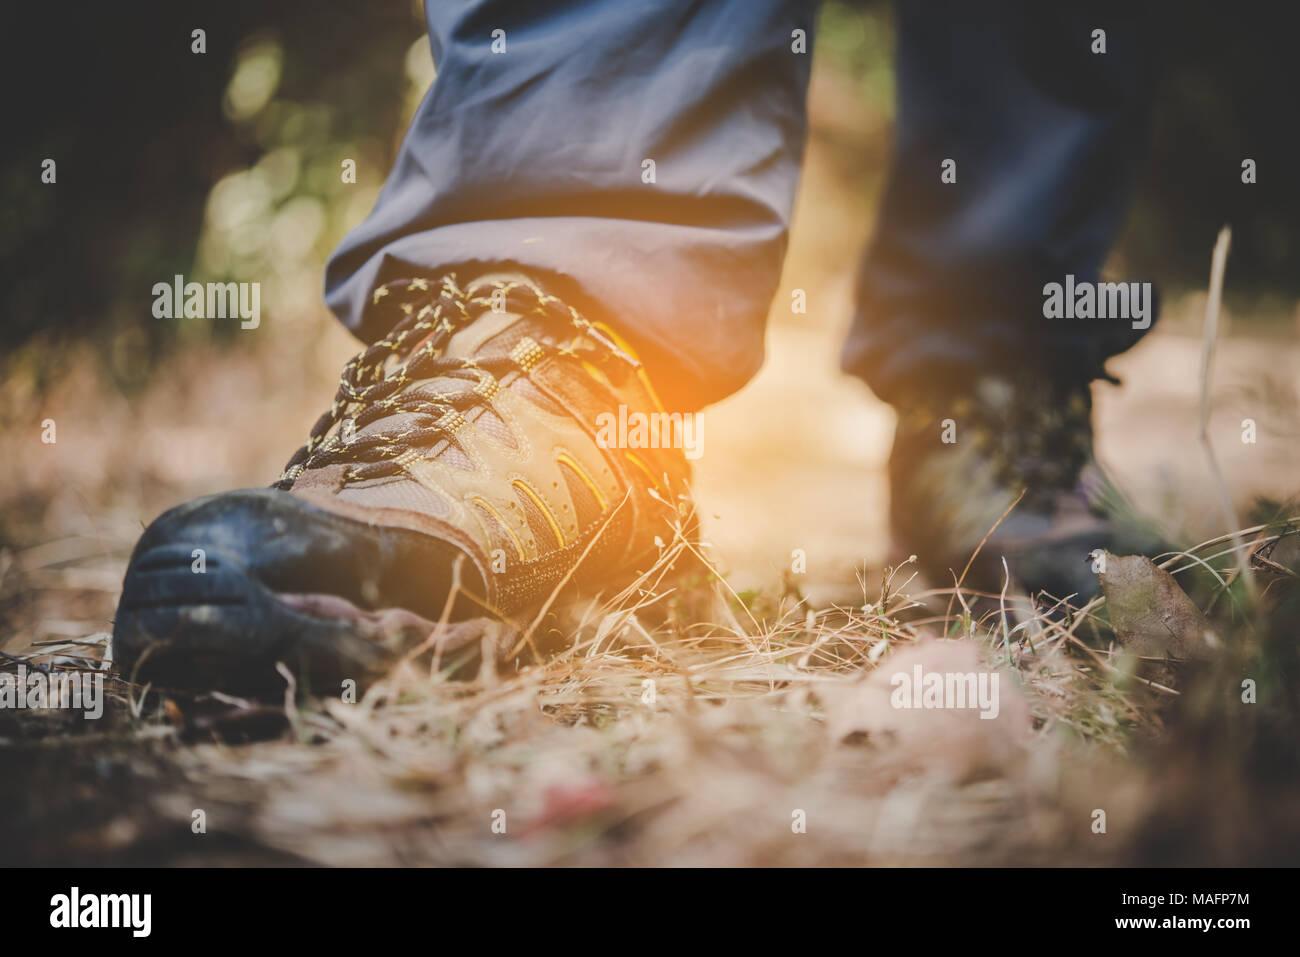 Close Up Of Adventure Man Feet Walk On A Mountain Path Stock